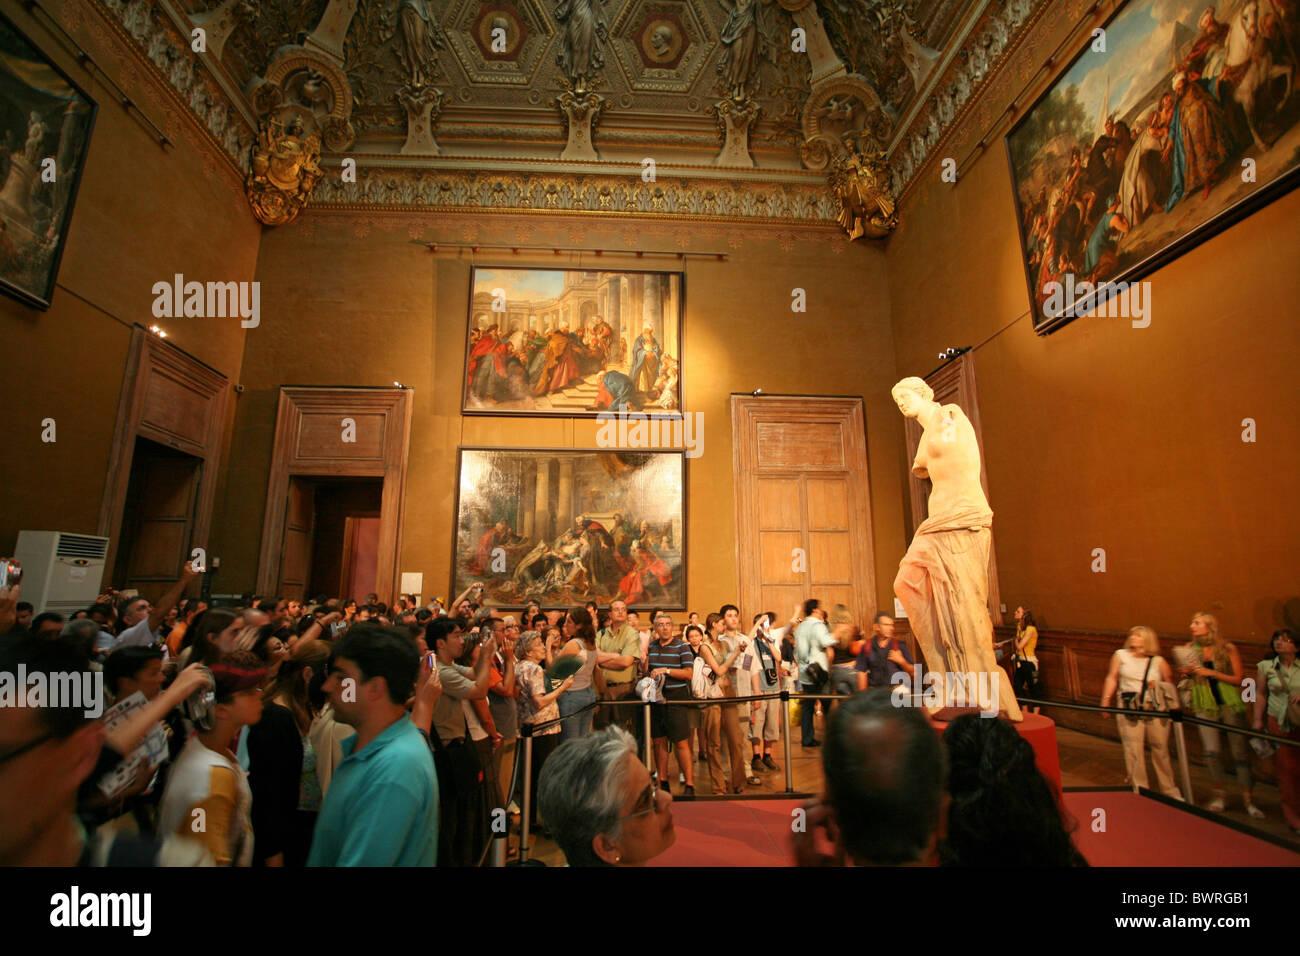 Venus de Milo Louvre museum Paris France Europe Indoor Inside ancient Greek statue sculpture art culture ol - Stock Image